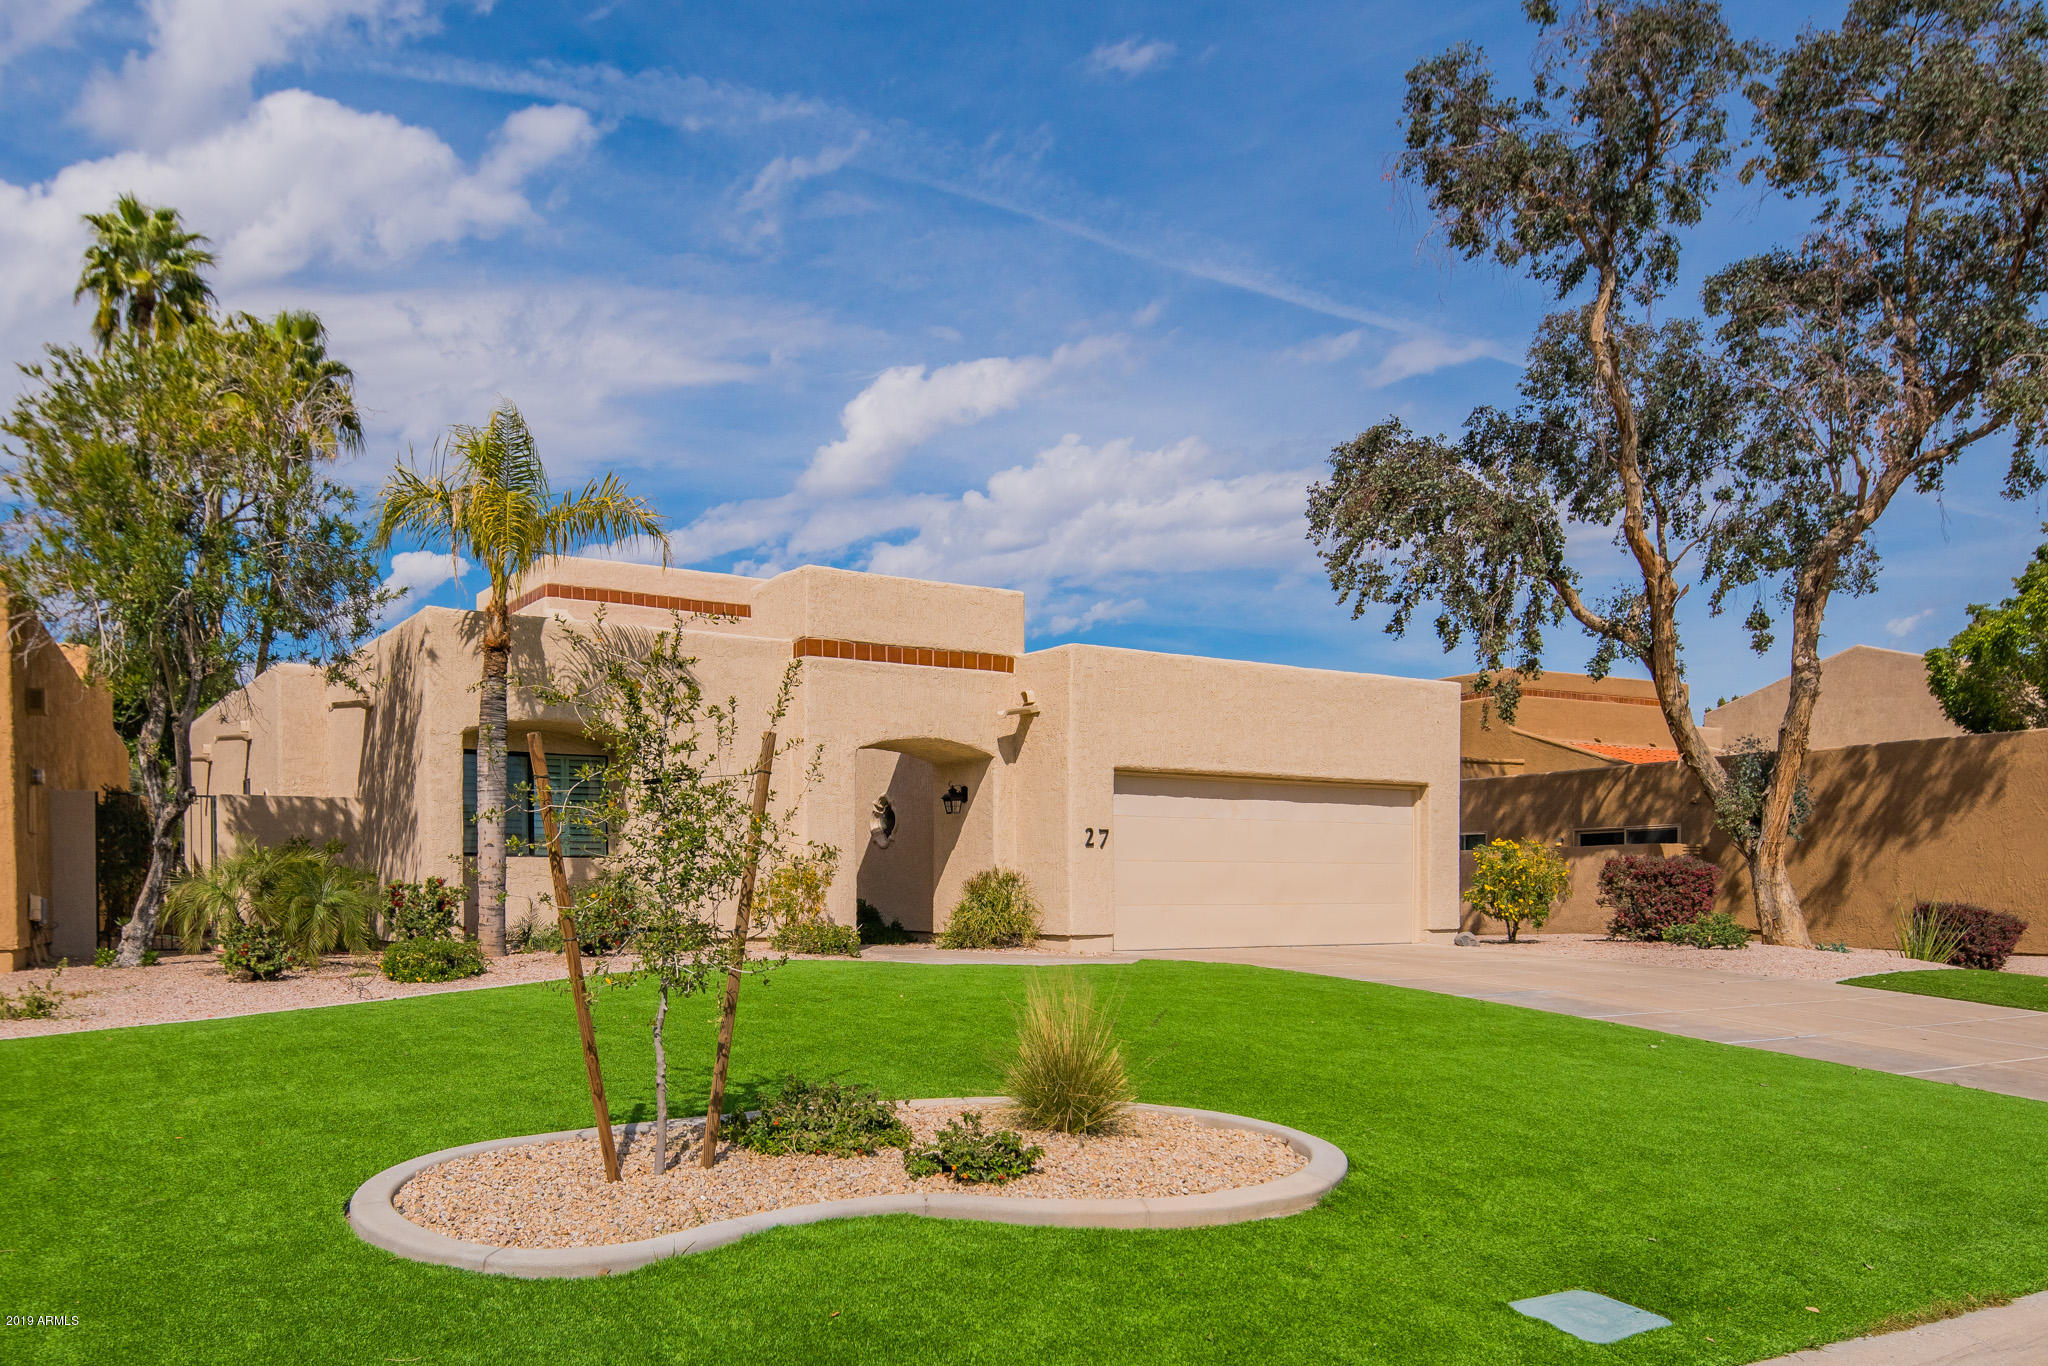 Photo of 2626 E ARIZONA BILTMORE Circle #27, Phoenix, AZ 85016